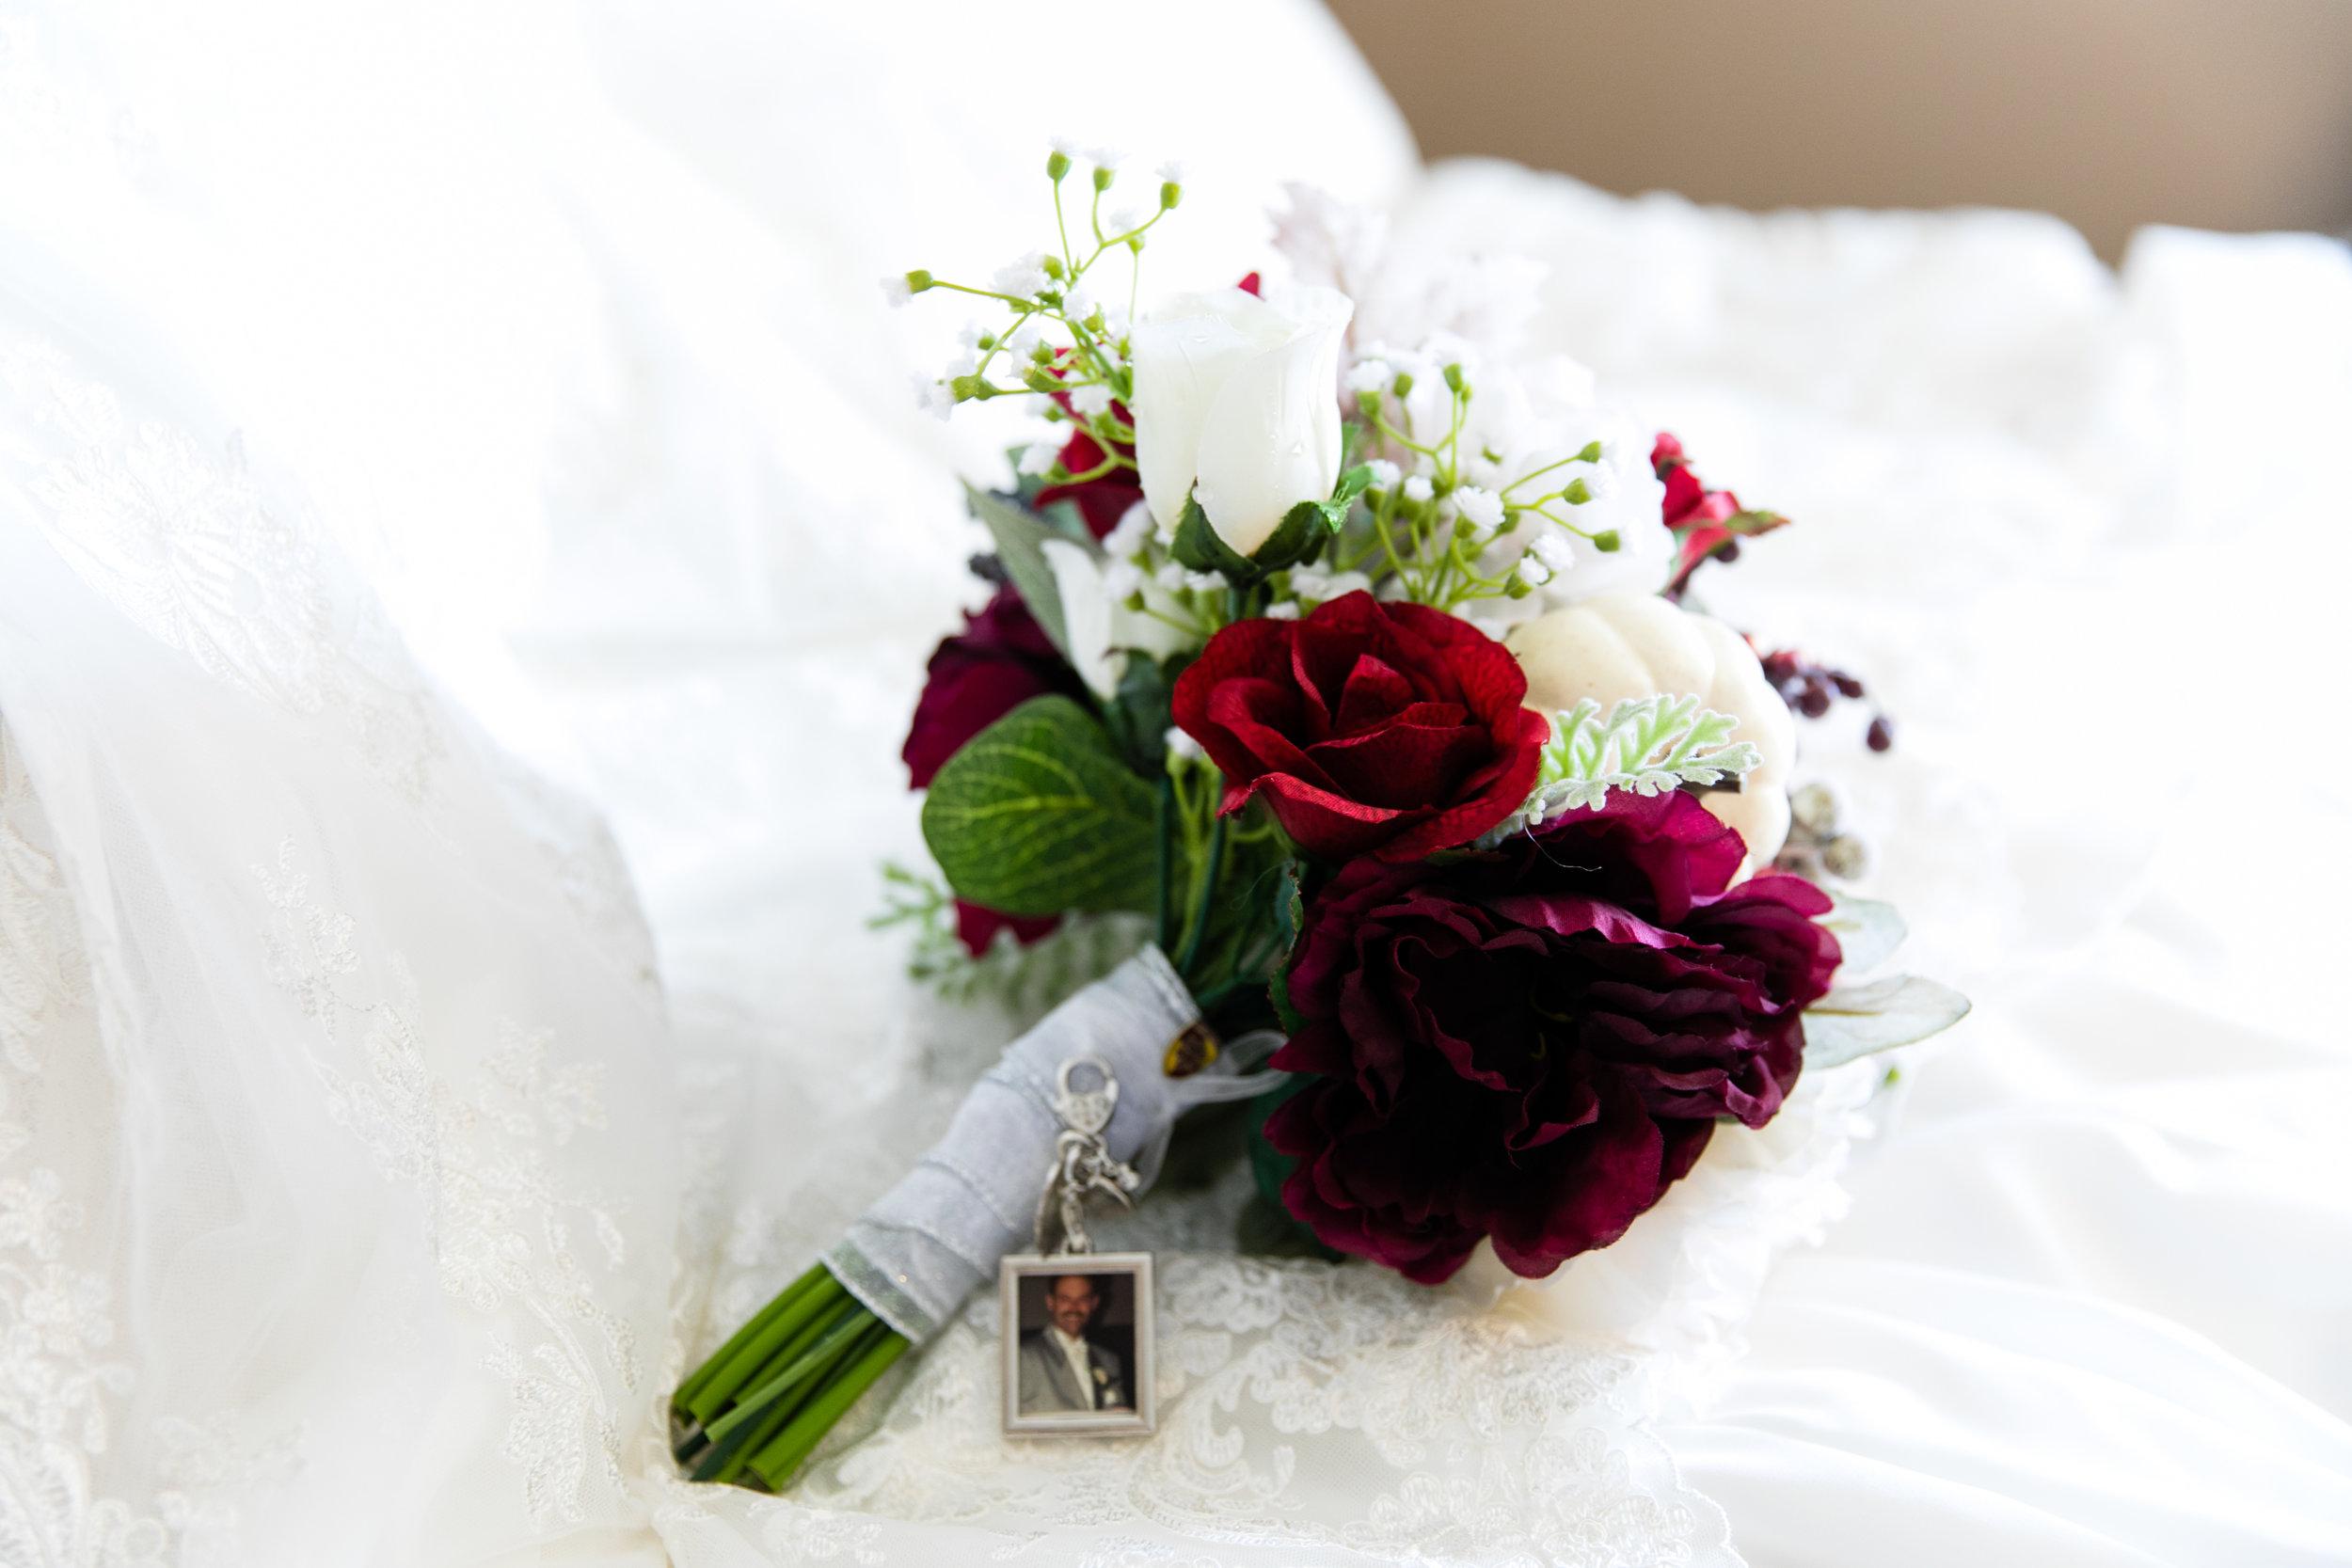 Ashly and Joe - Felt Factory Wedding - Harry Potter Themed Wedding - 004.jpg